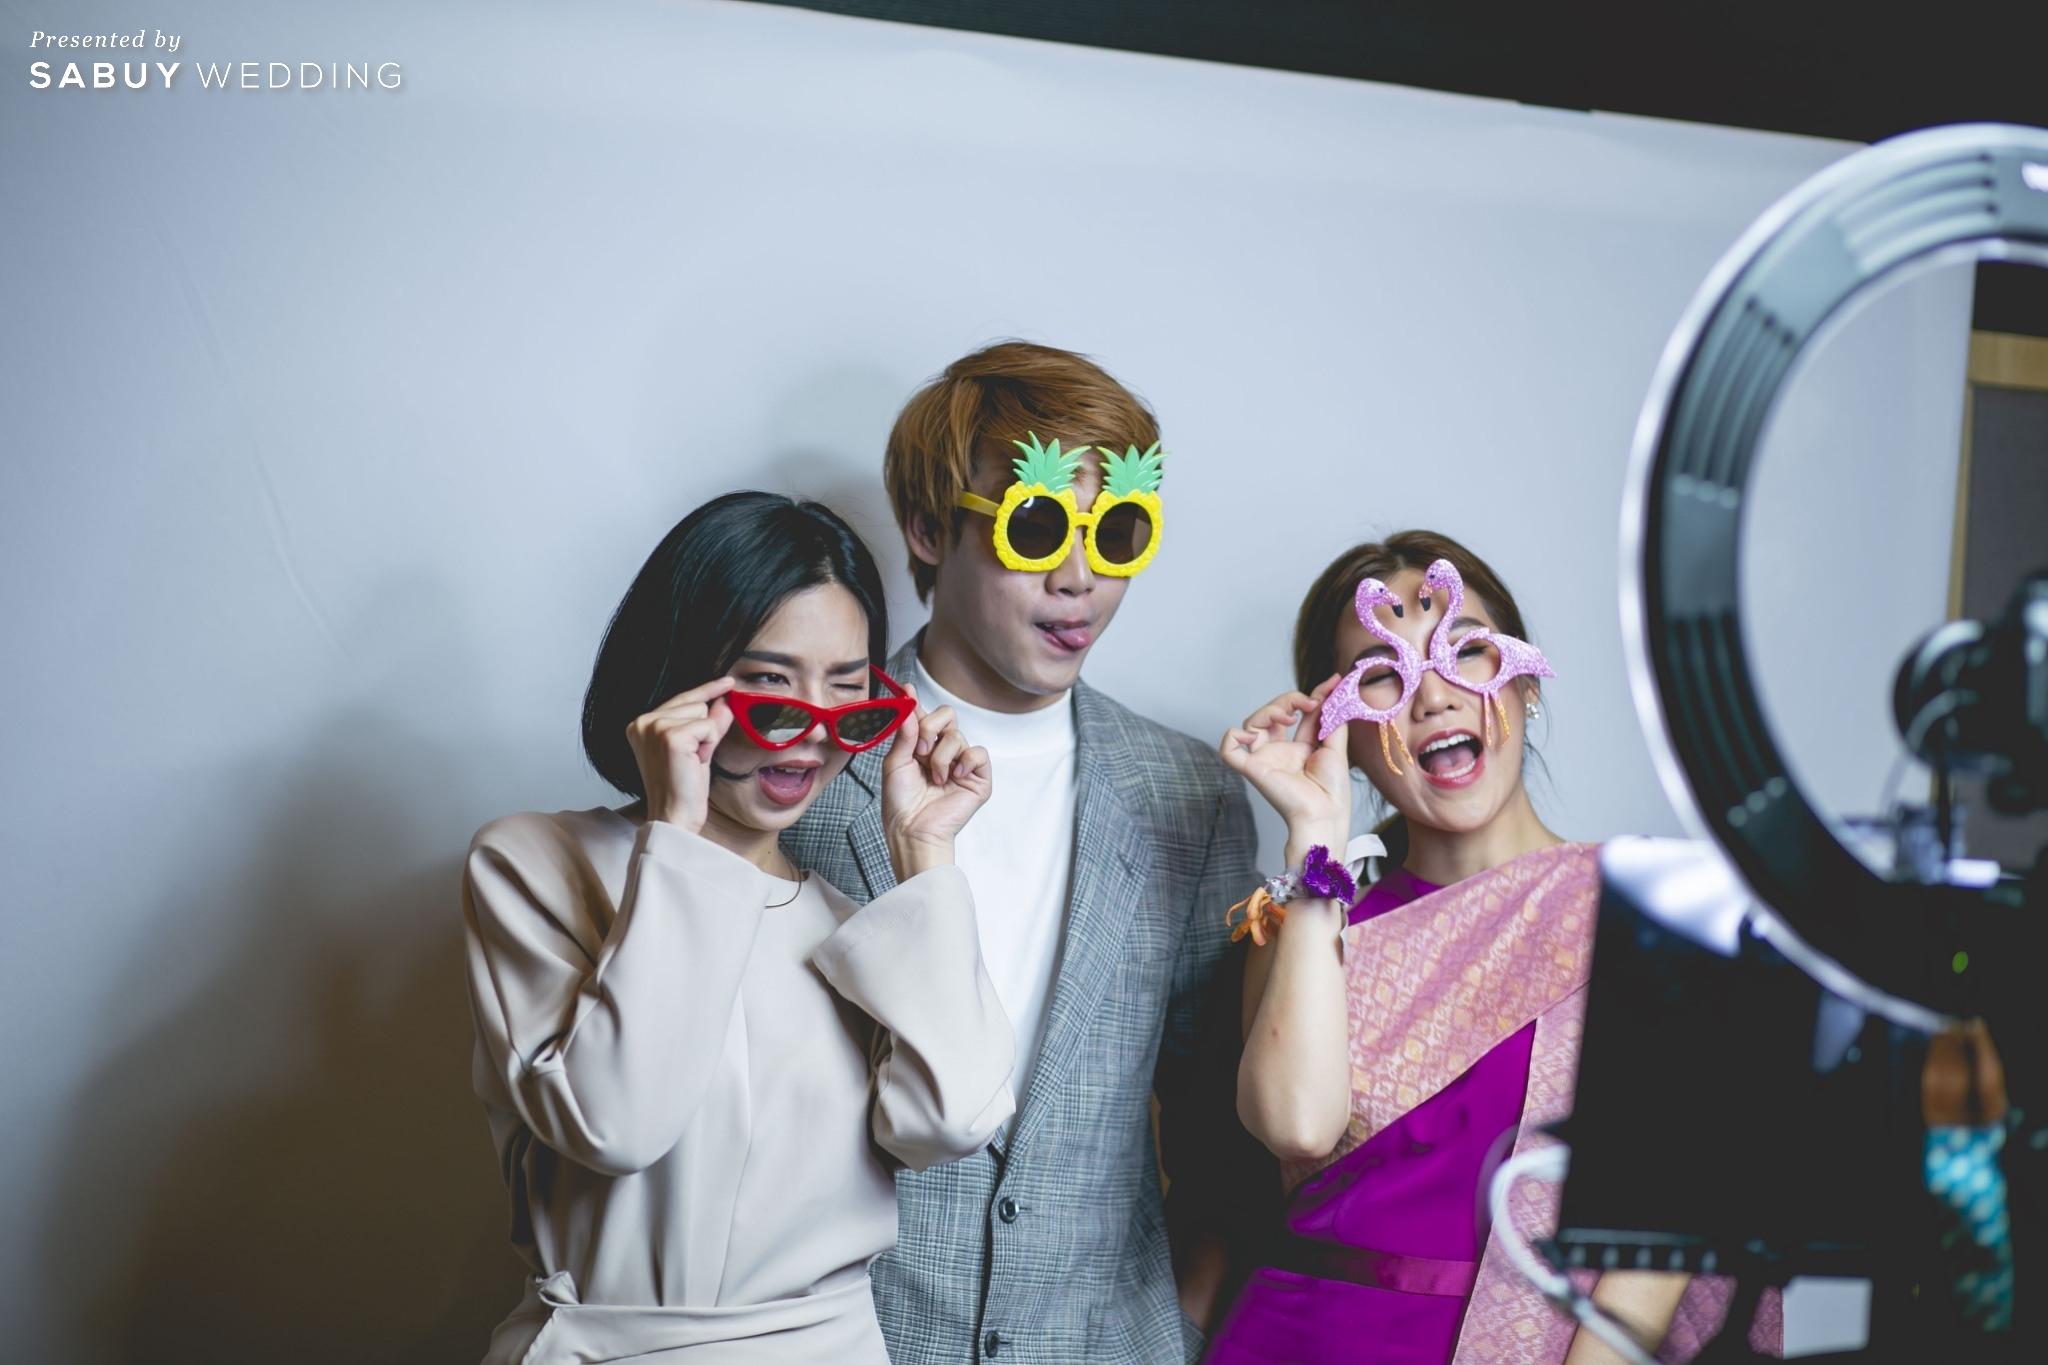 Photo booth รีวิวงานแต่งแซ่บจี๊ดใจ สวยสดใสด้วยโทนสี Colorful @ AVANI+ Riverside Bangkok Hotel